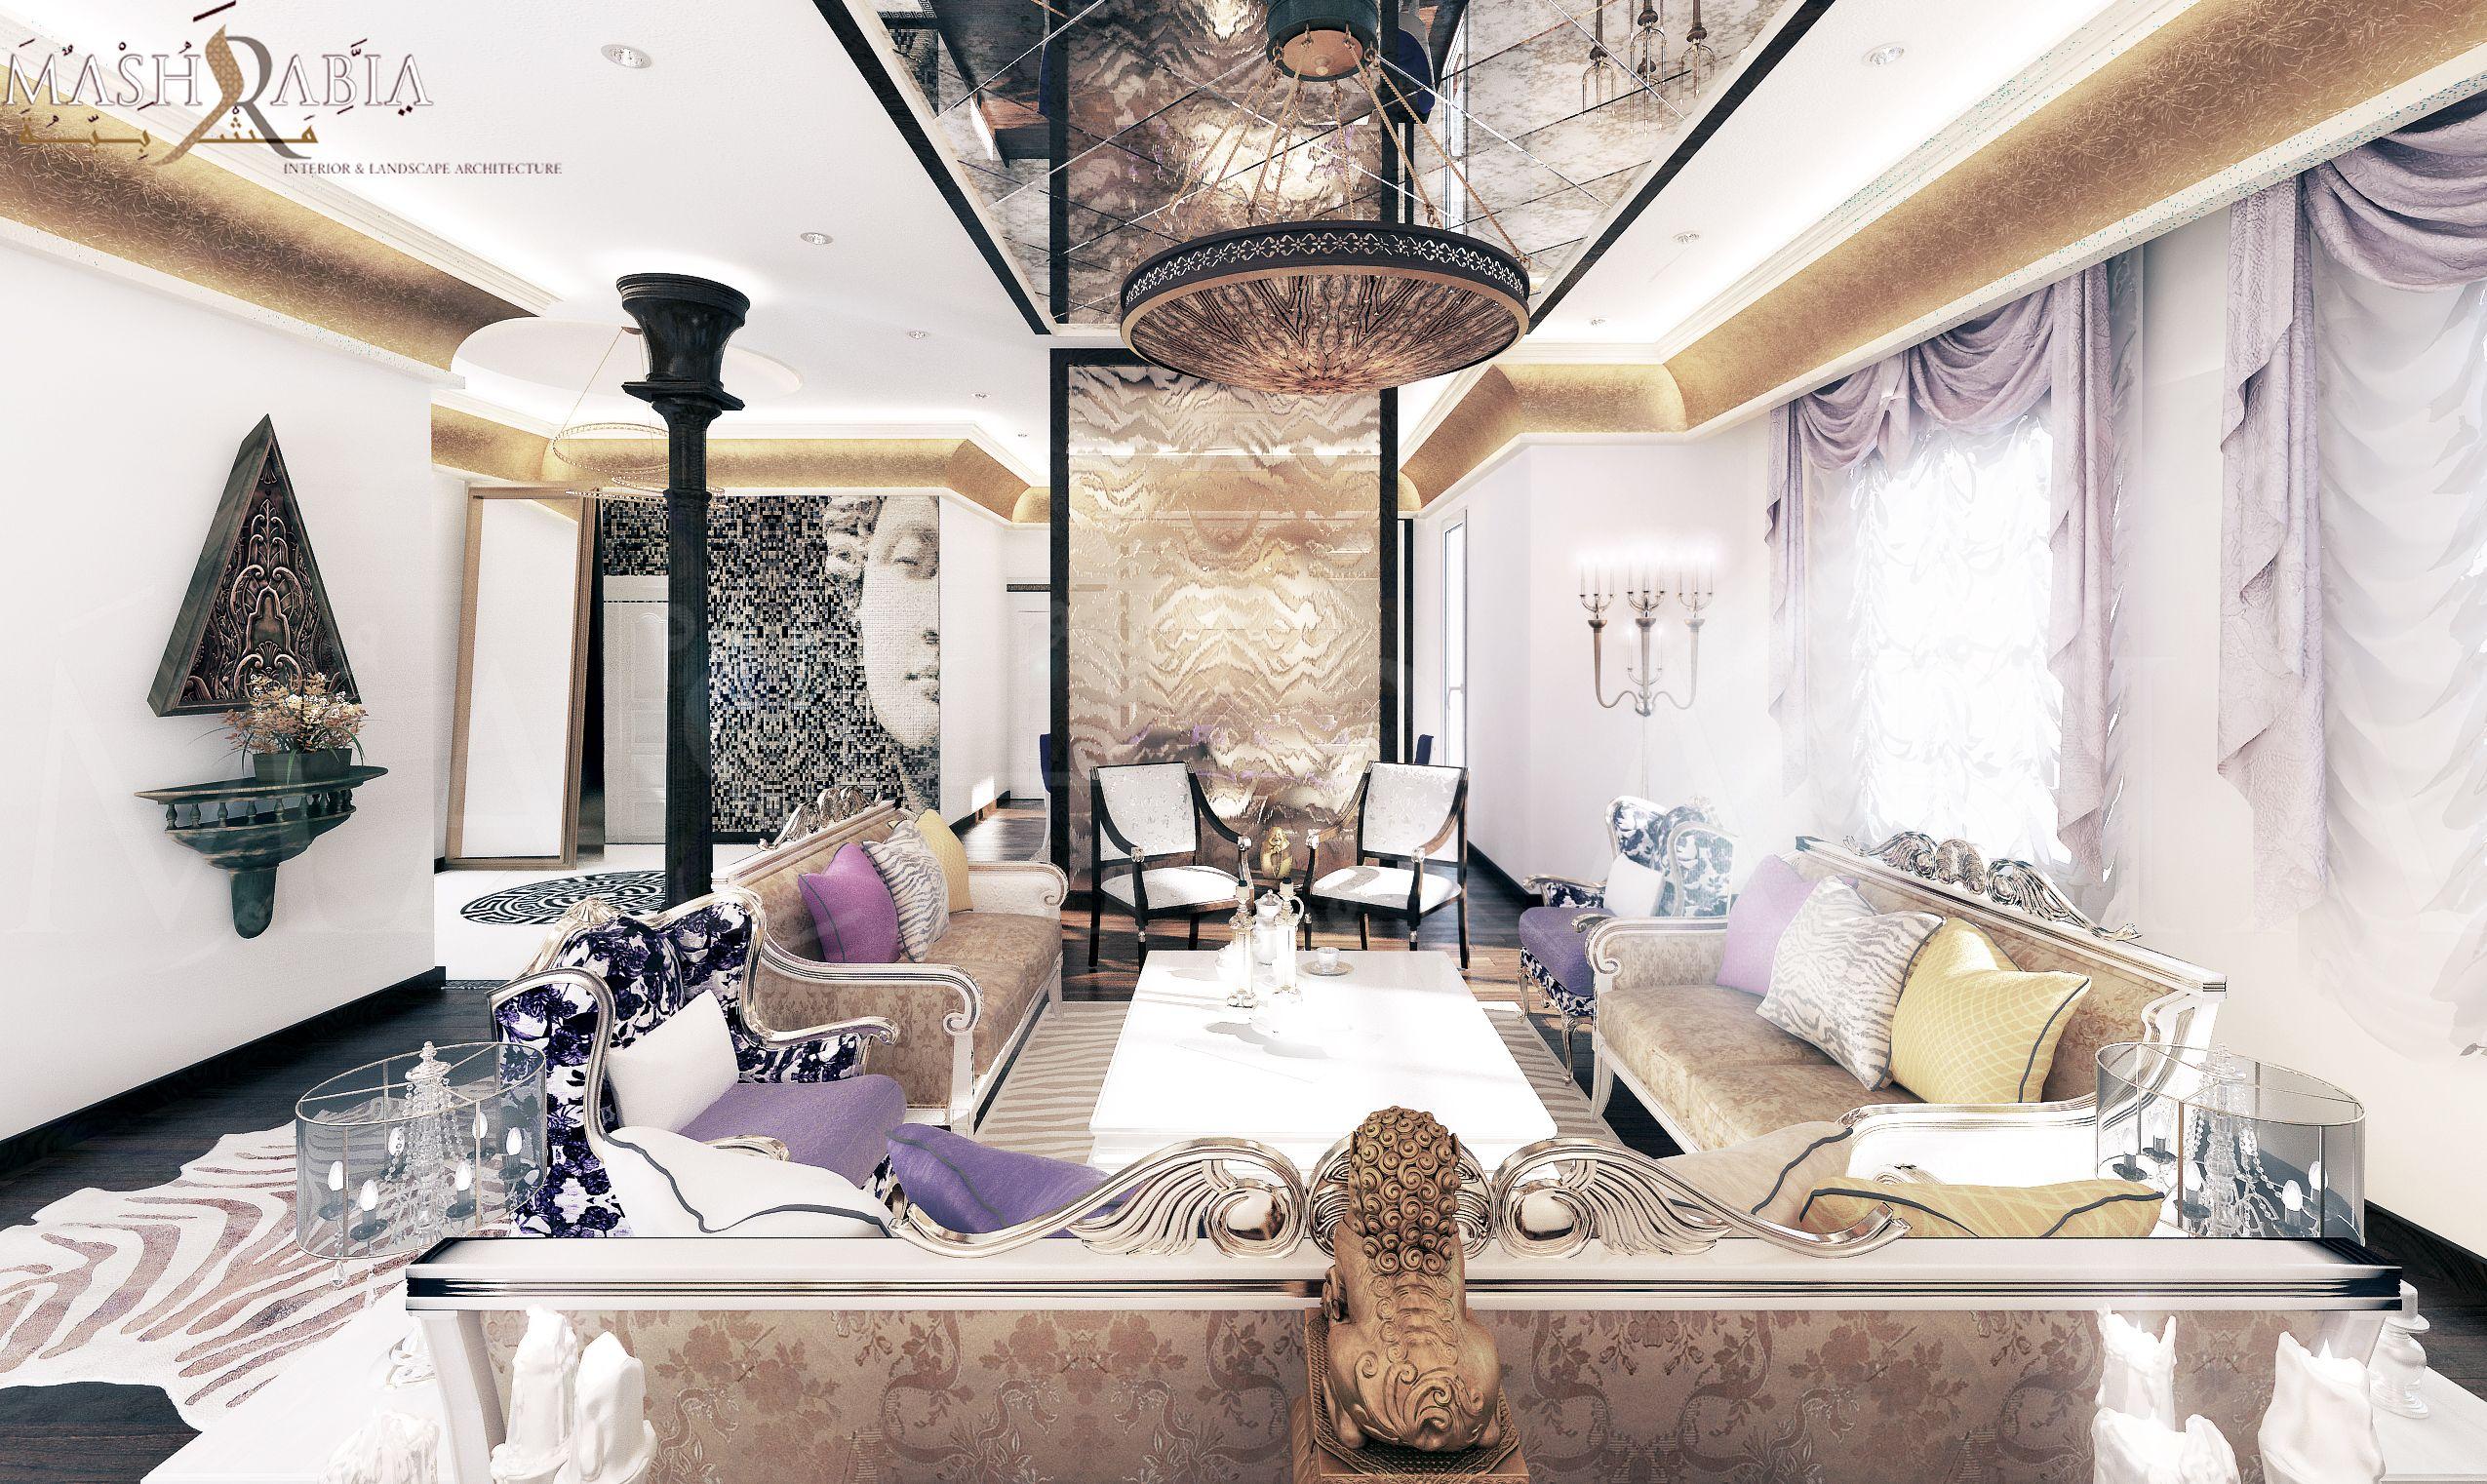 #Magnificent_Family_Lounge #Seating #simple #Classic_design #classic_furniture #cold_colors #Cavalli_Tiger #Golden_Cornice #back_view @mashrabiadesign